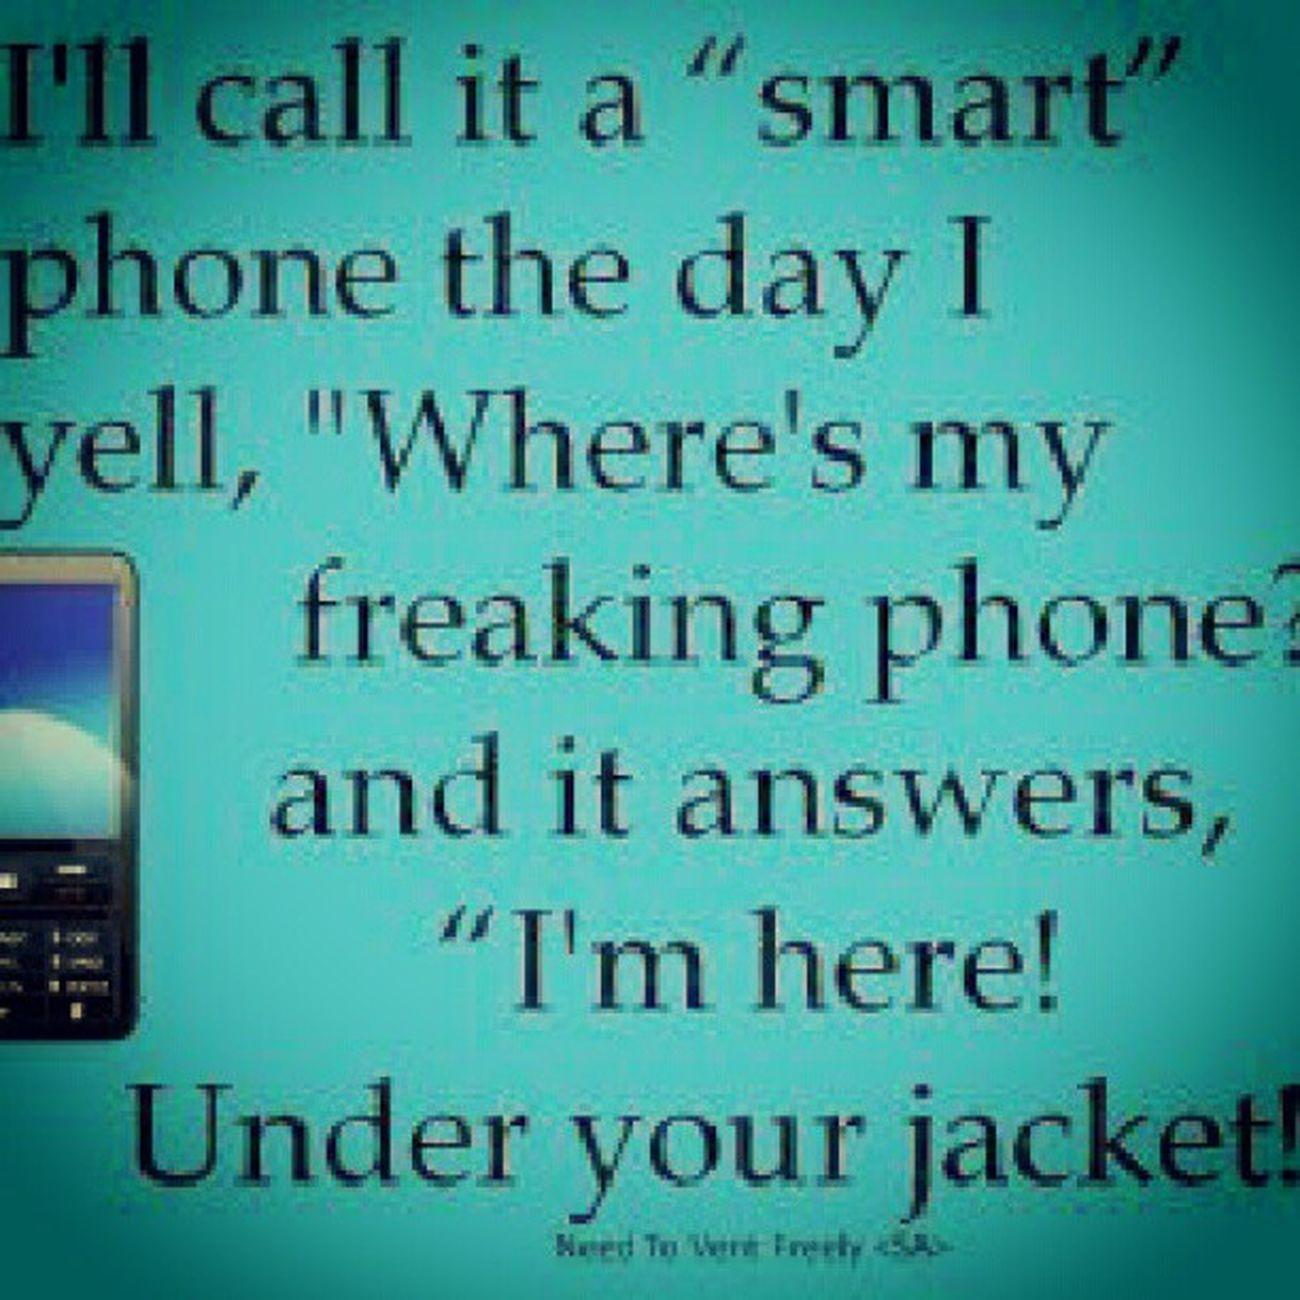 Yep, pretty much. SmartPhoneMyAss . Lol